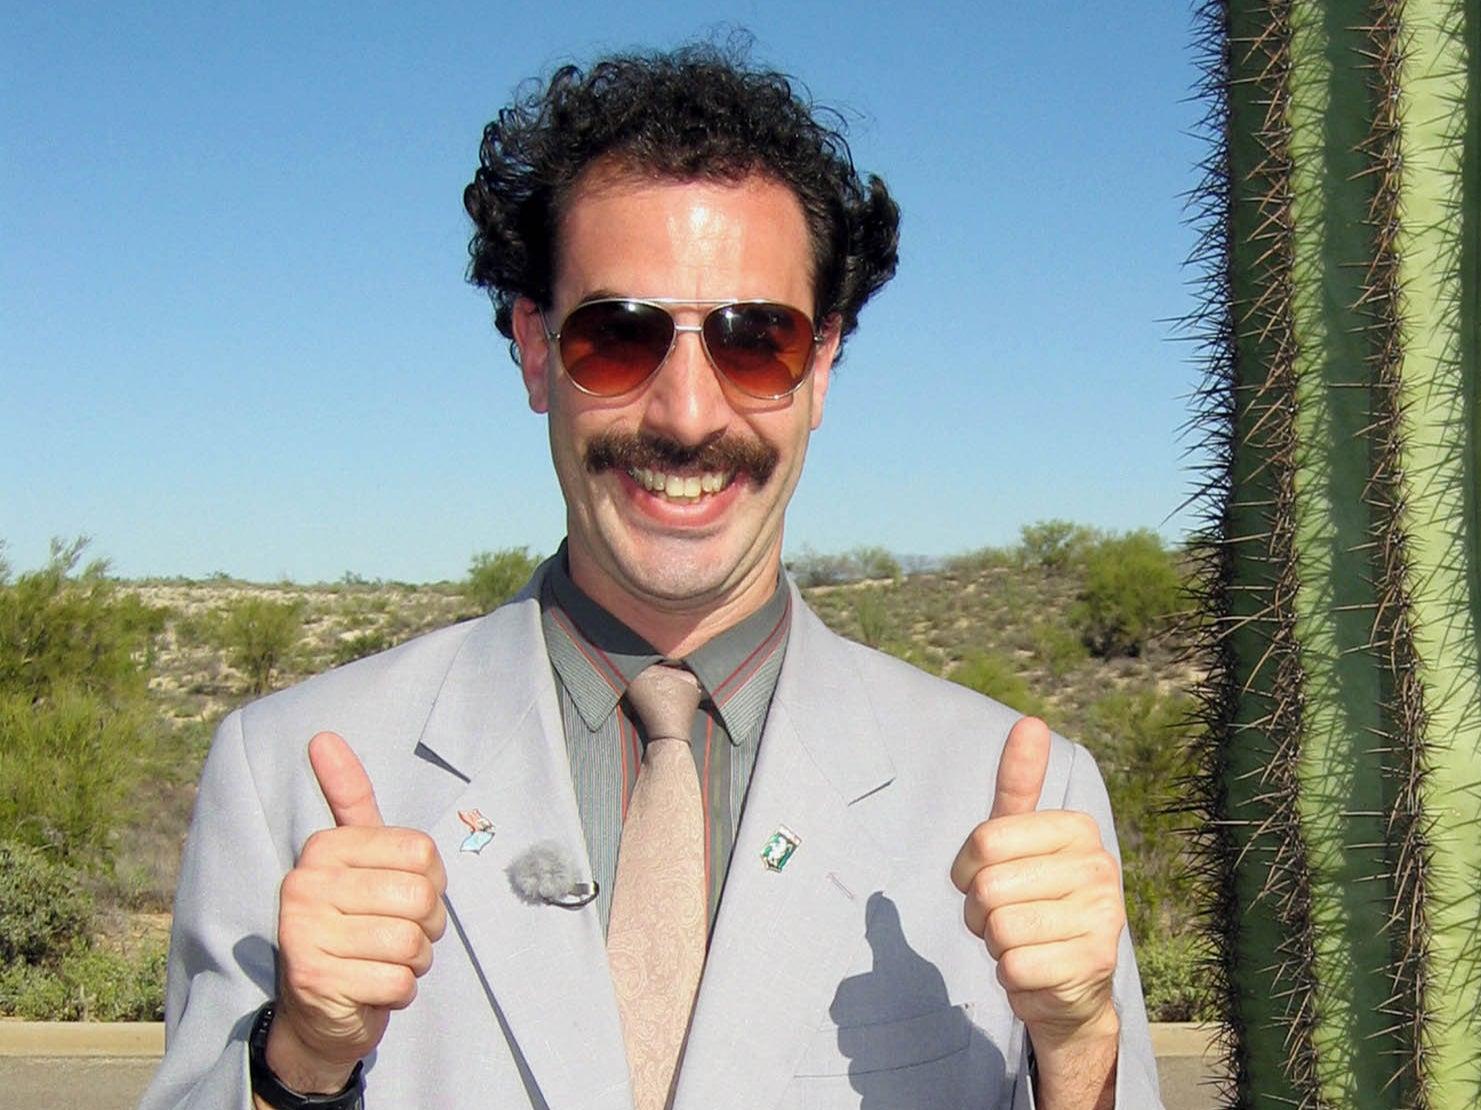 Sacha Baron Cohen's Borat sequel has an obscenely long working title